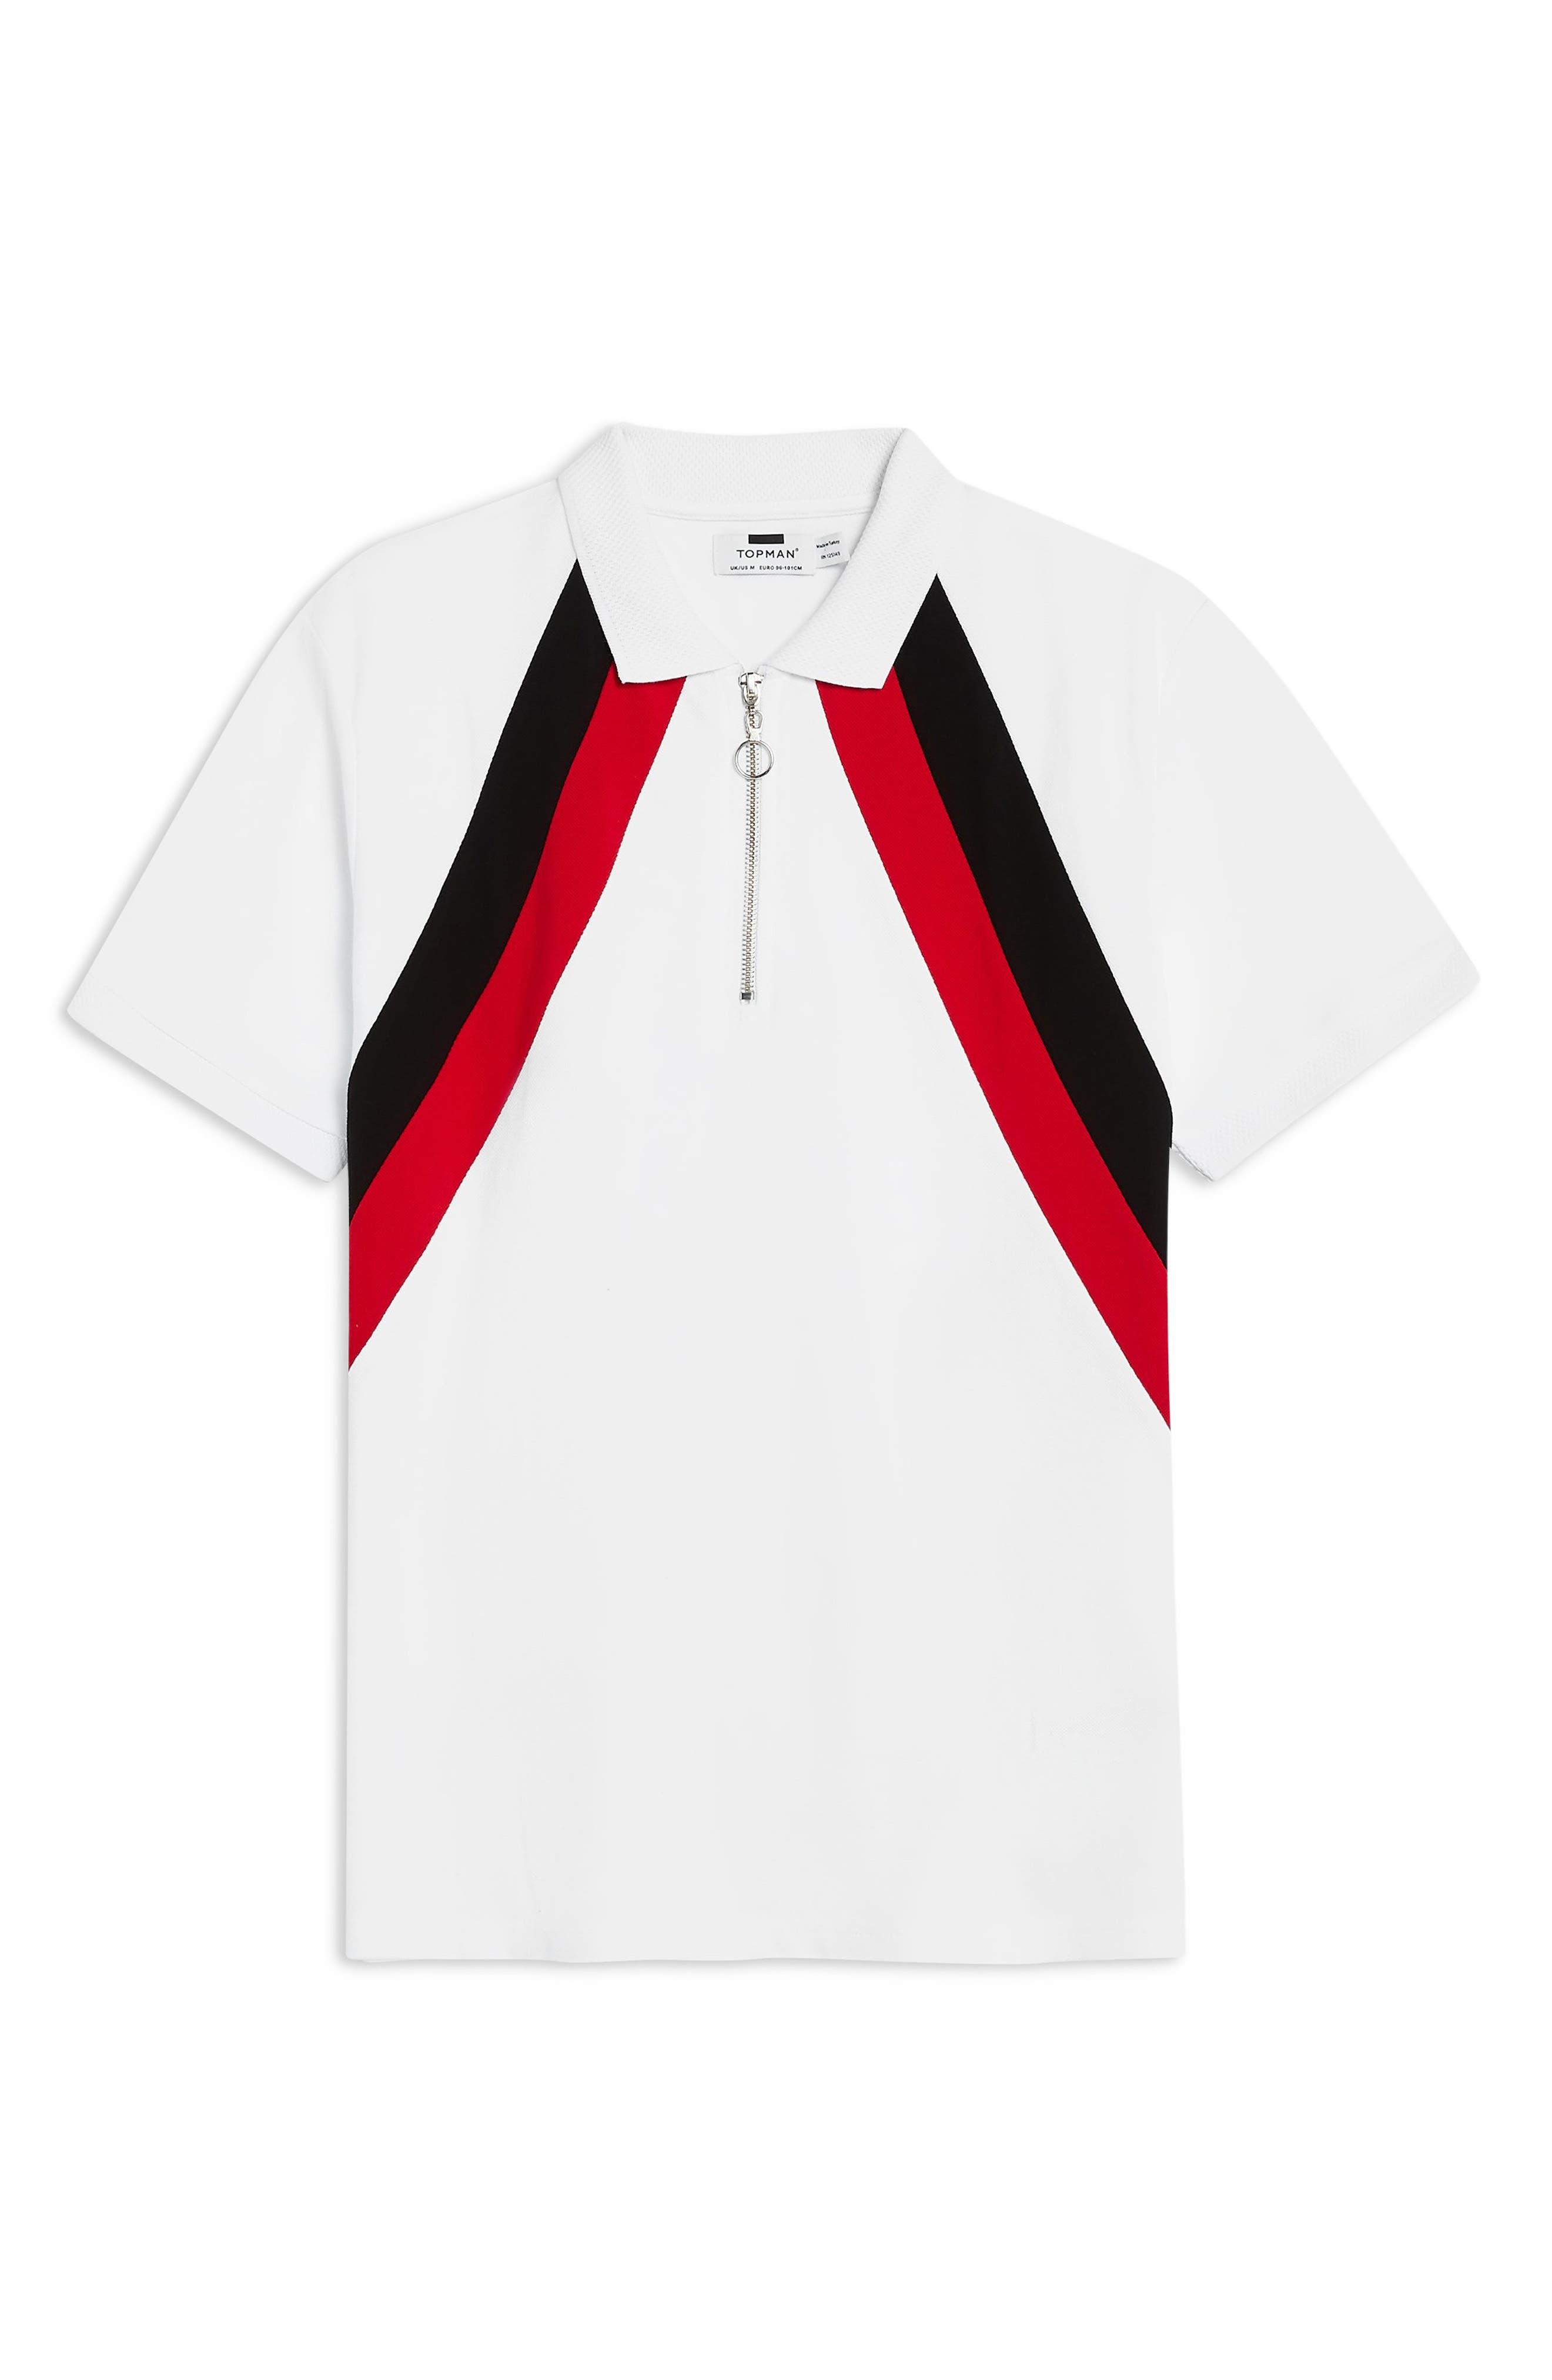 TOPMAN, Stripe Zip Polo, Alternate thumbnail 4, color, WHITE